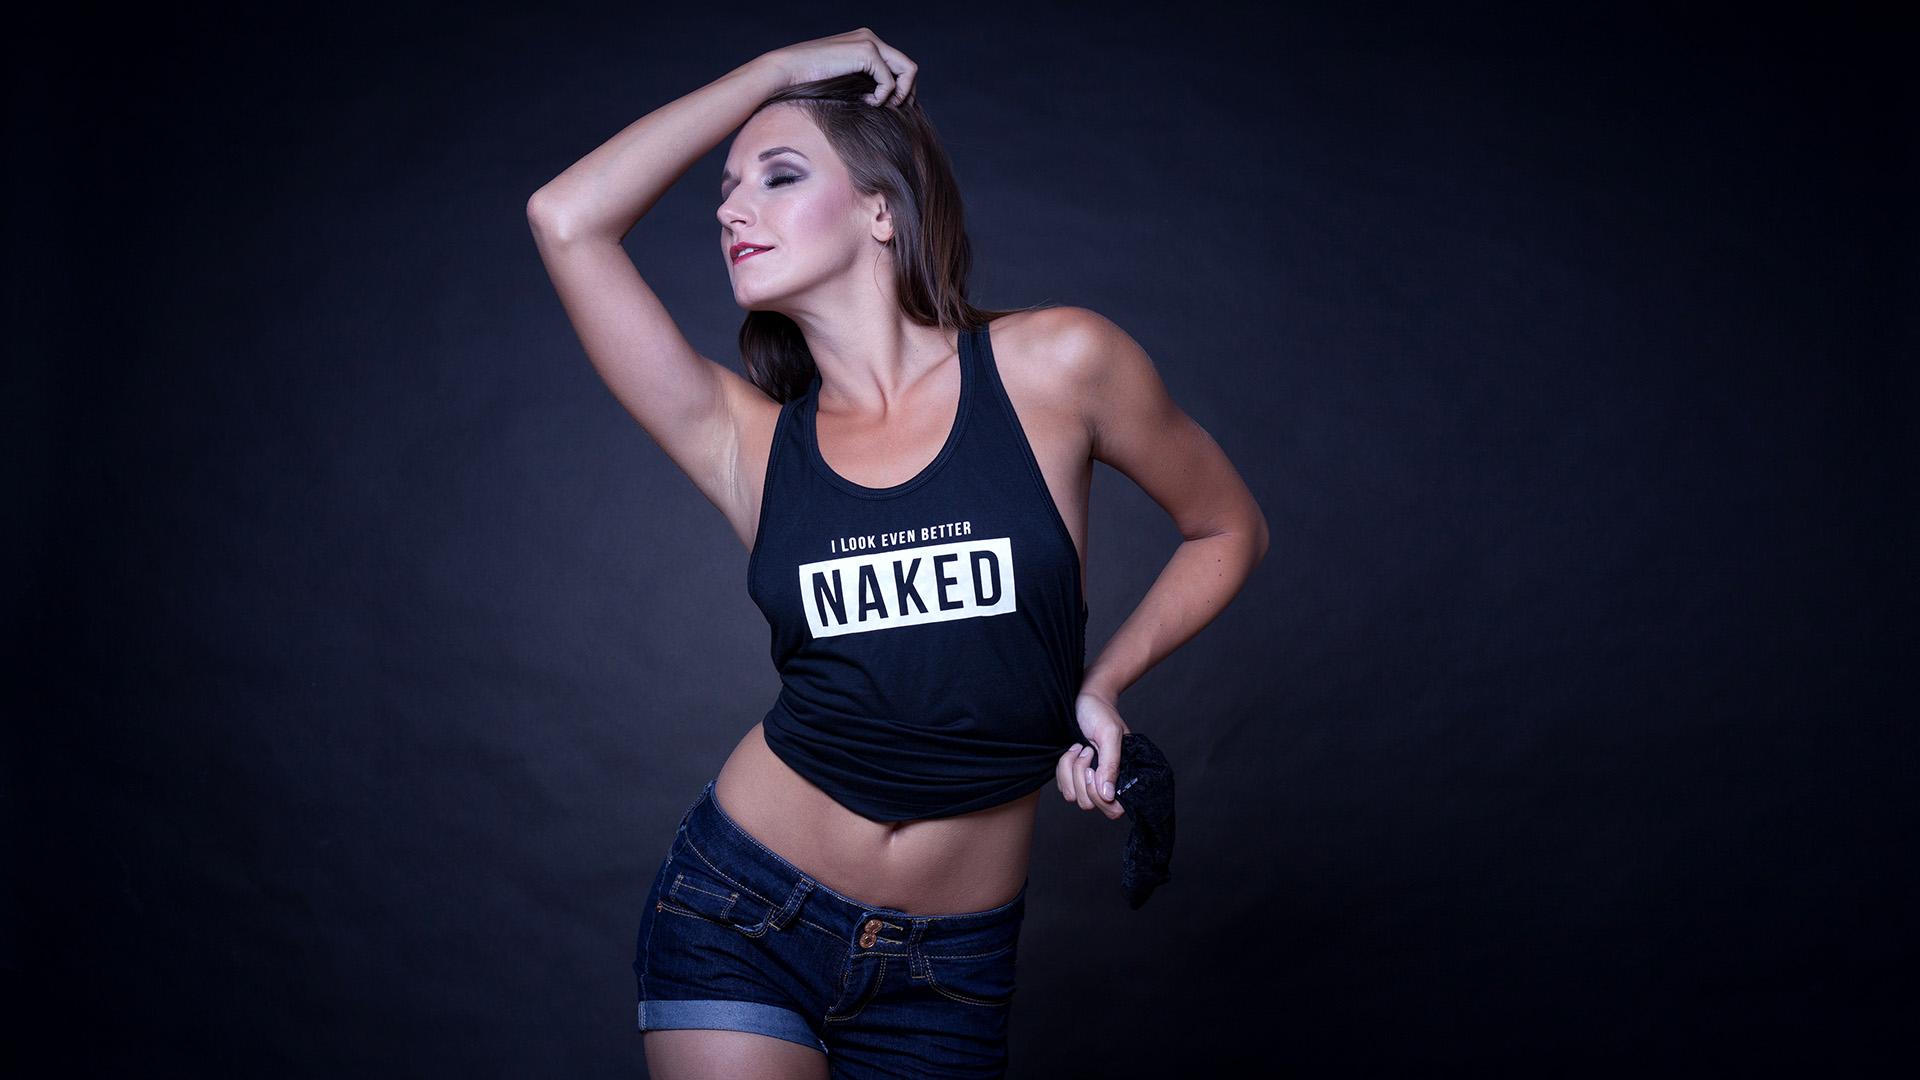 NakedMainpage